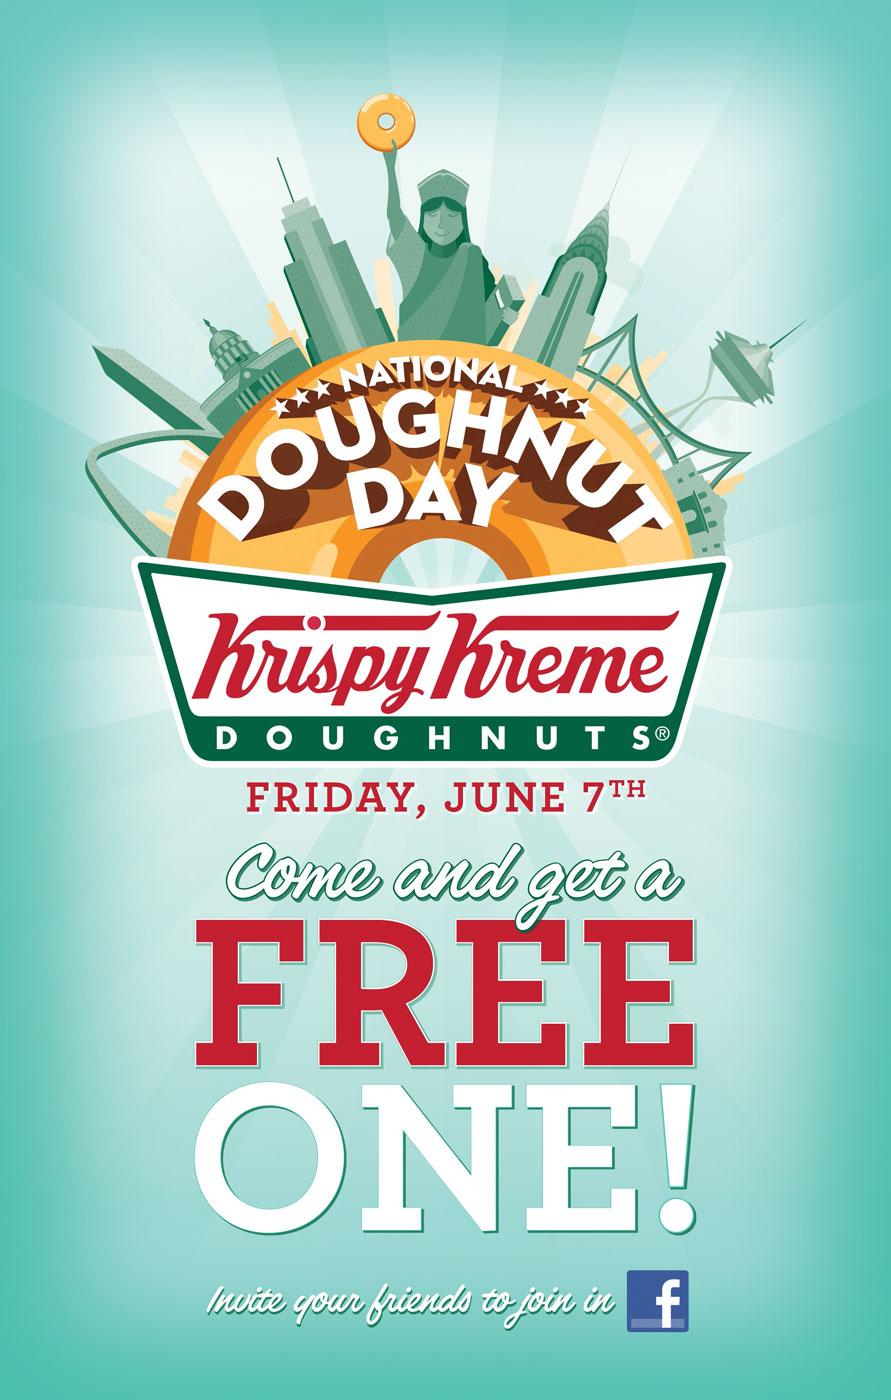 National Doughnut Day Poster